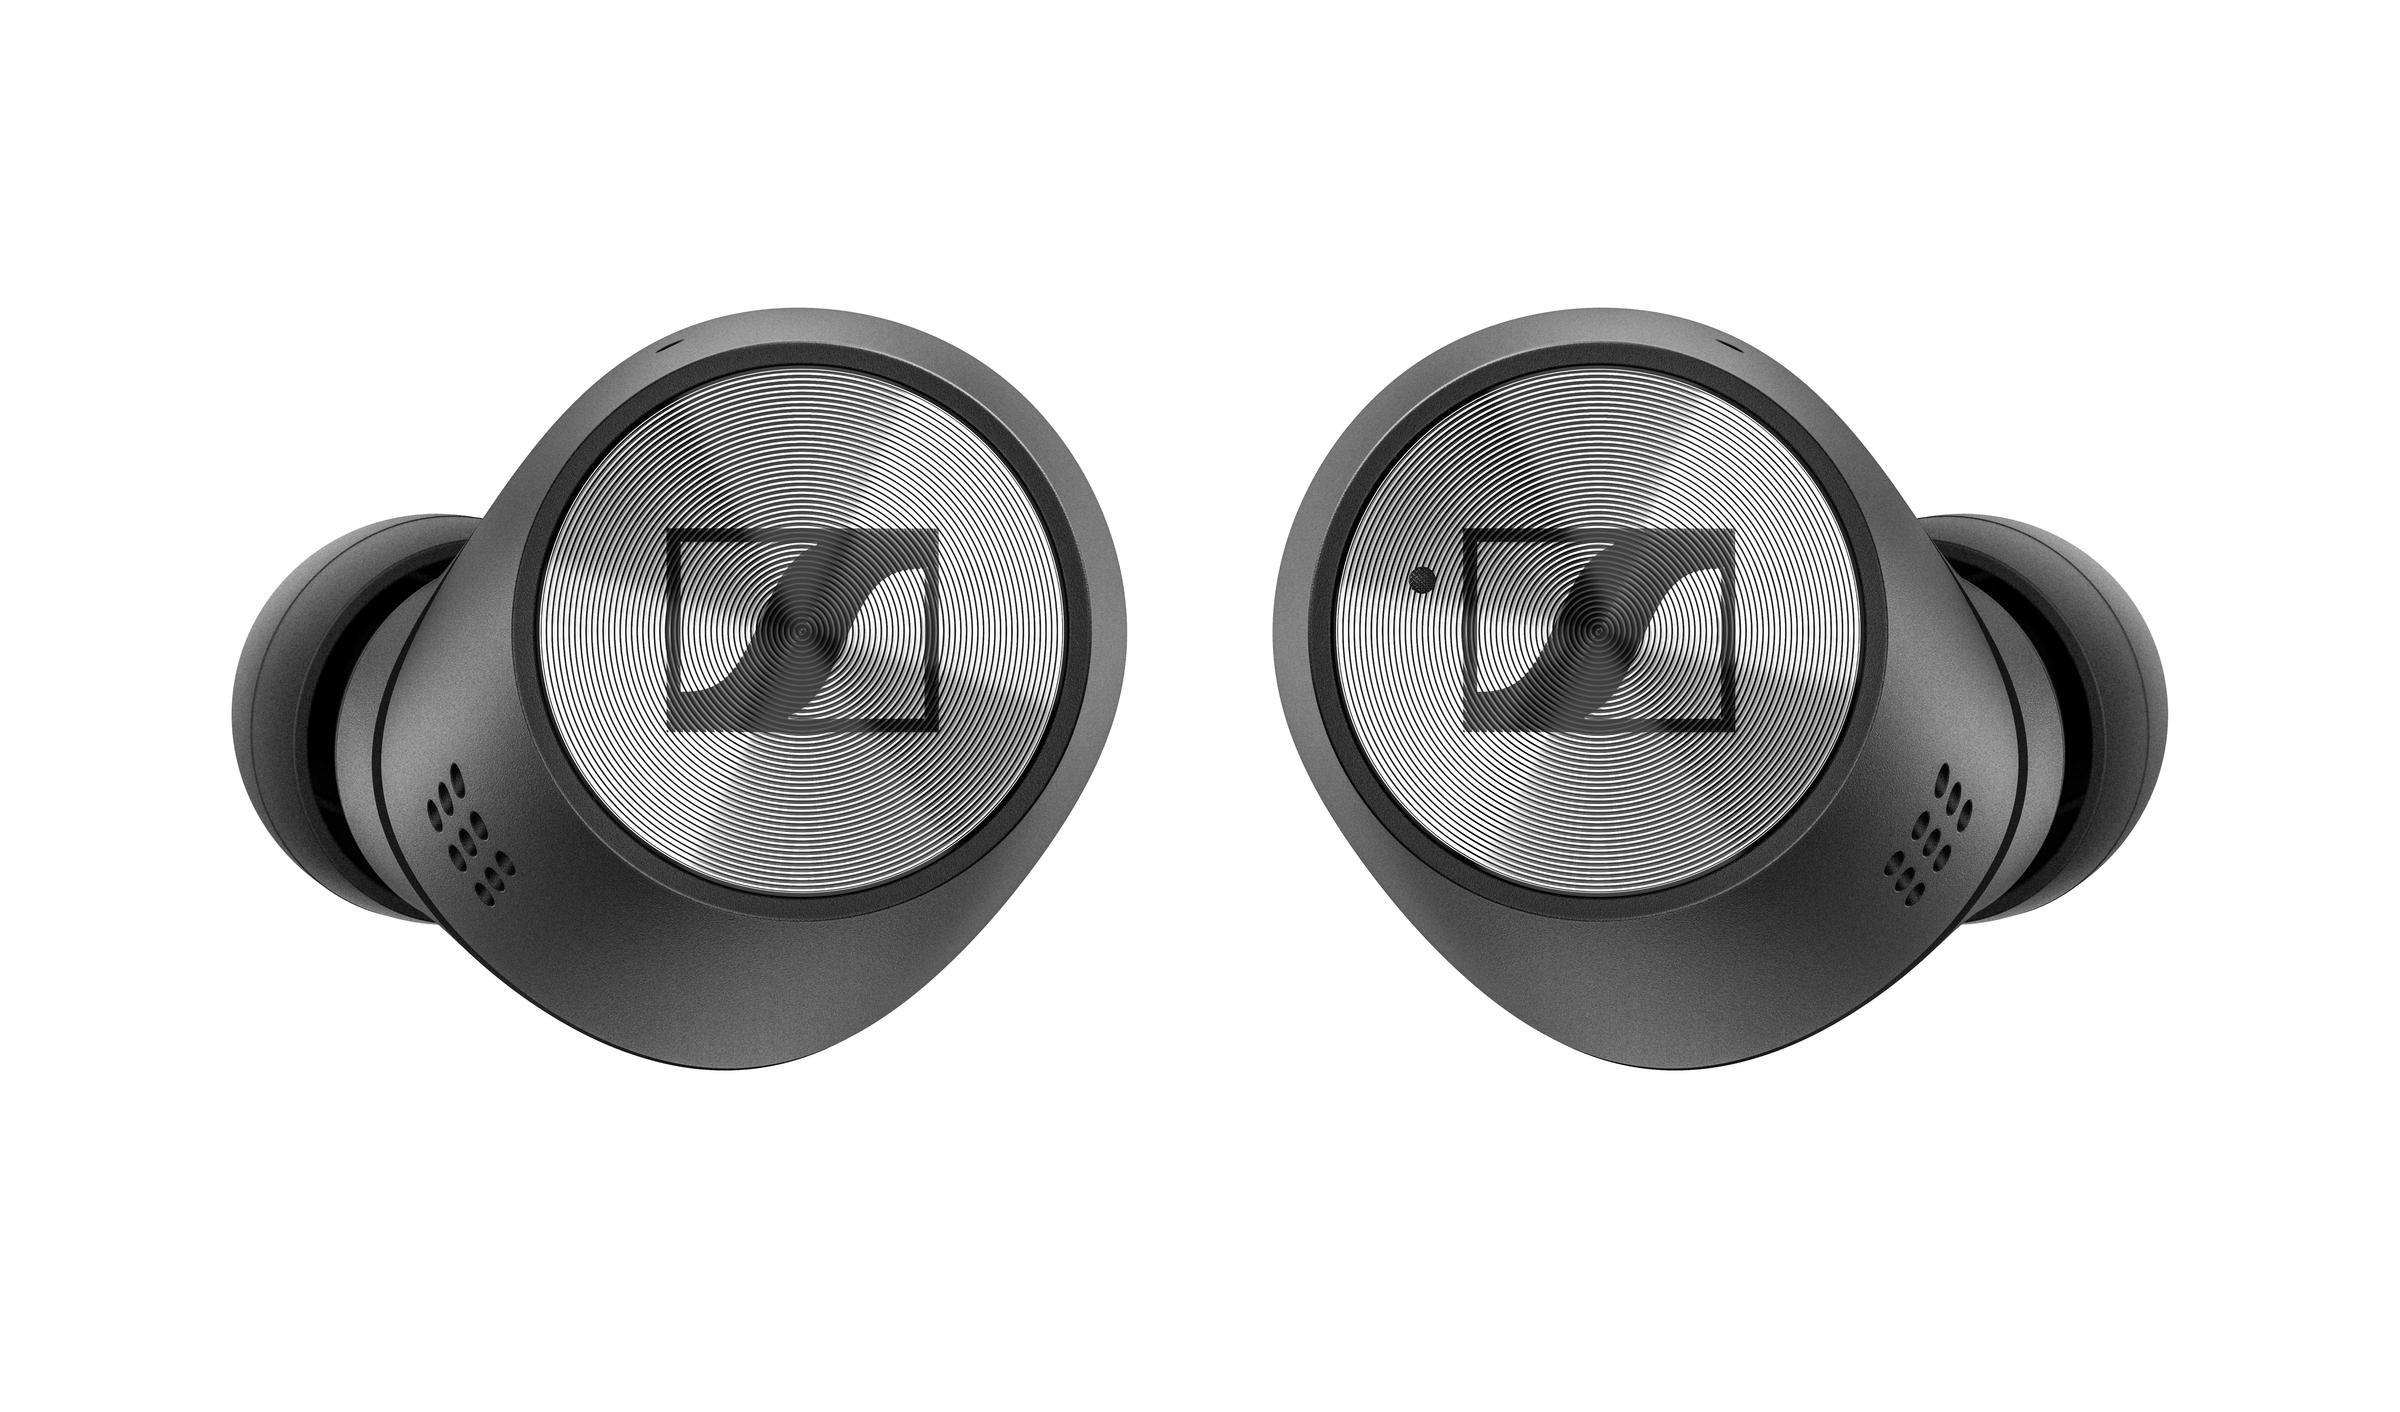 MOMENTUM_True_Wireless_2_Black_Earphone_Set_Product_shot_cutout_Front_02